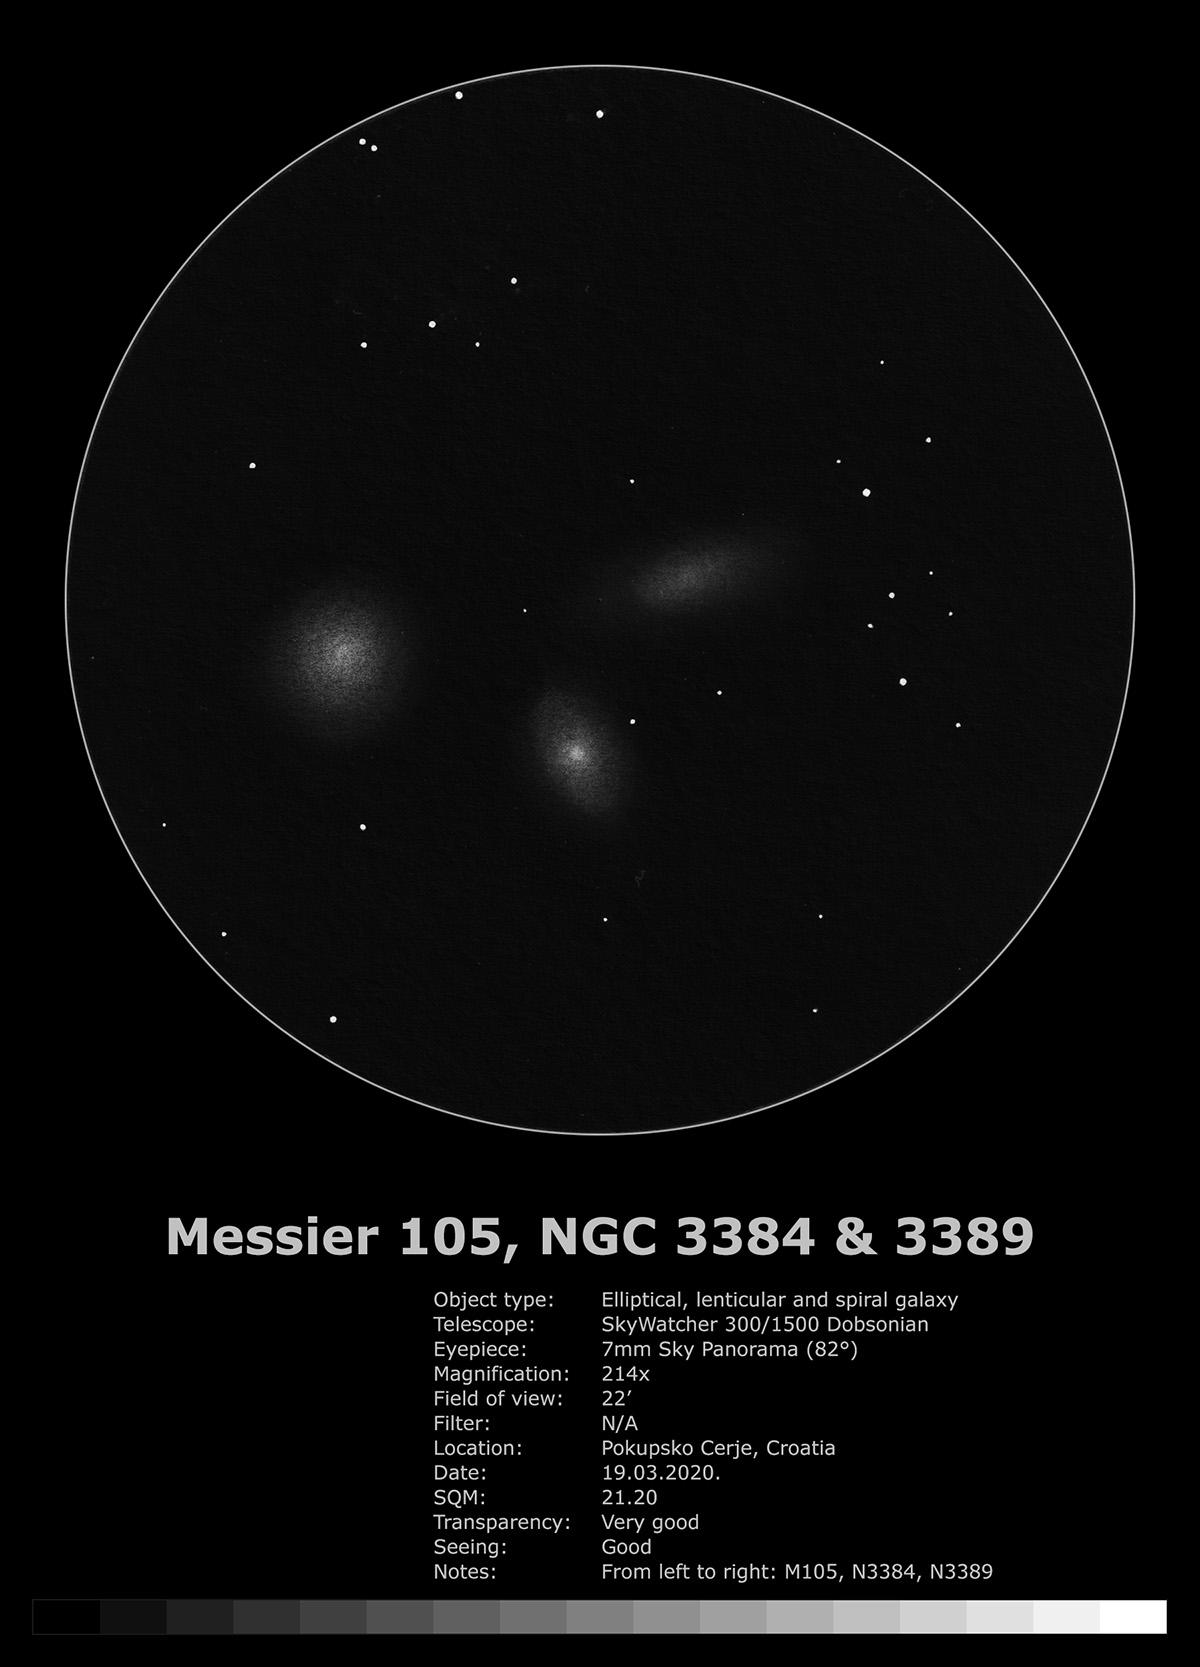 Messier 105, NHC 3384 i 3389